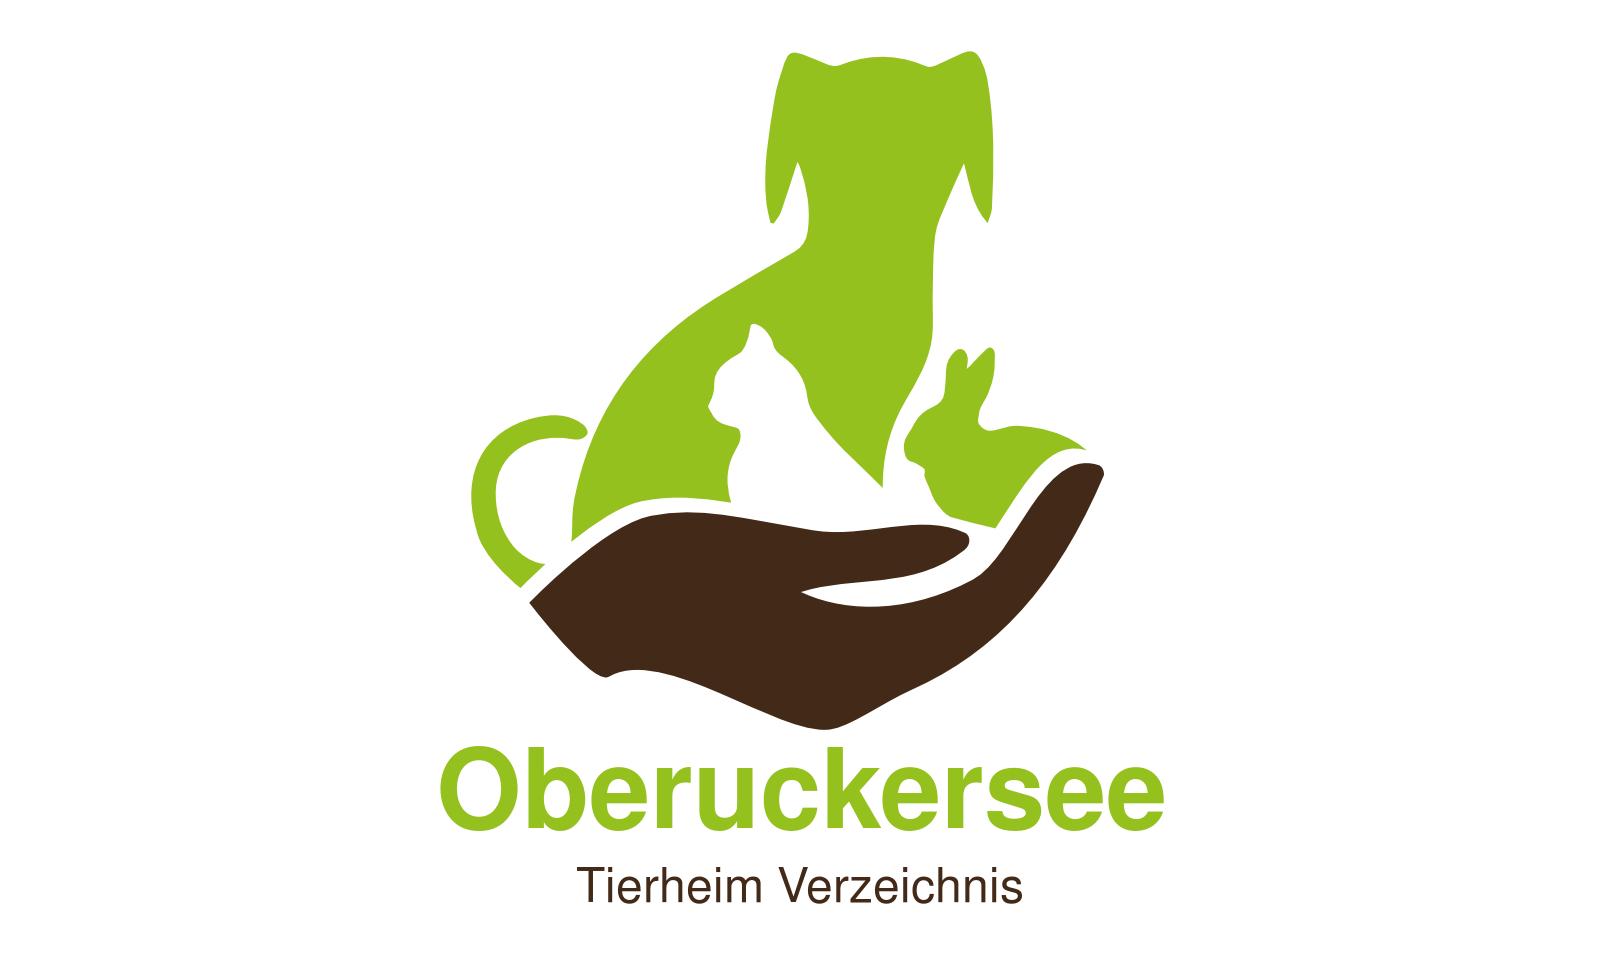 Tierheim Oberuckersee